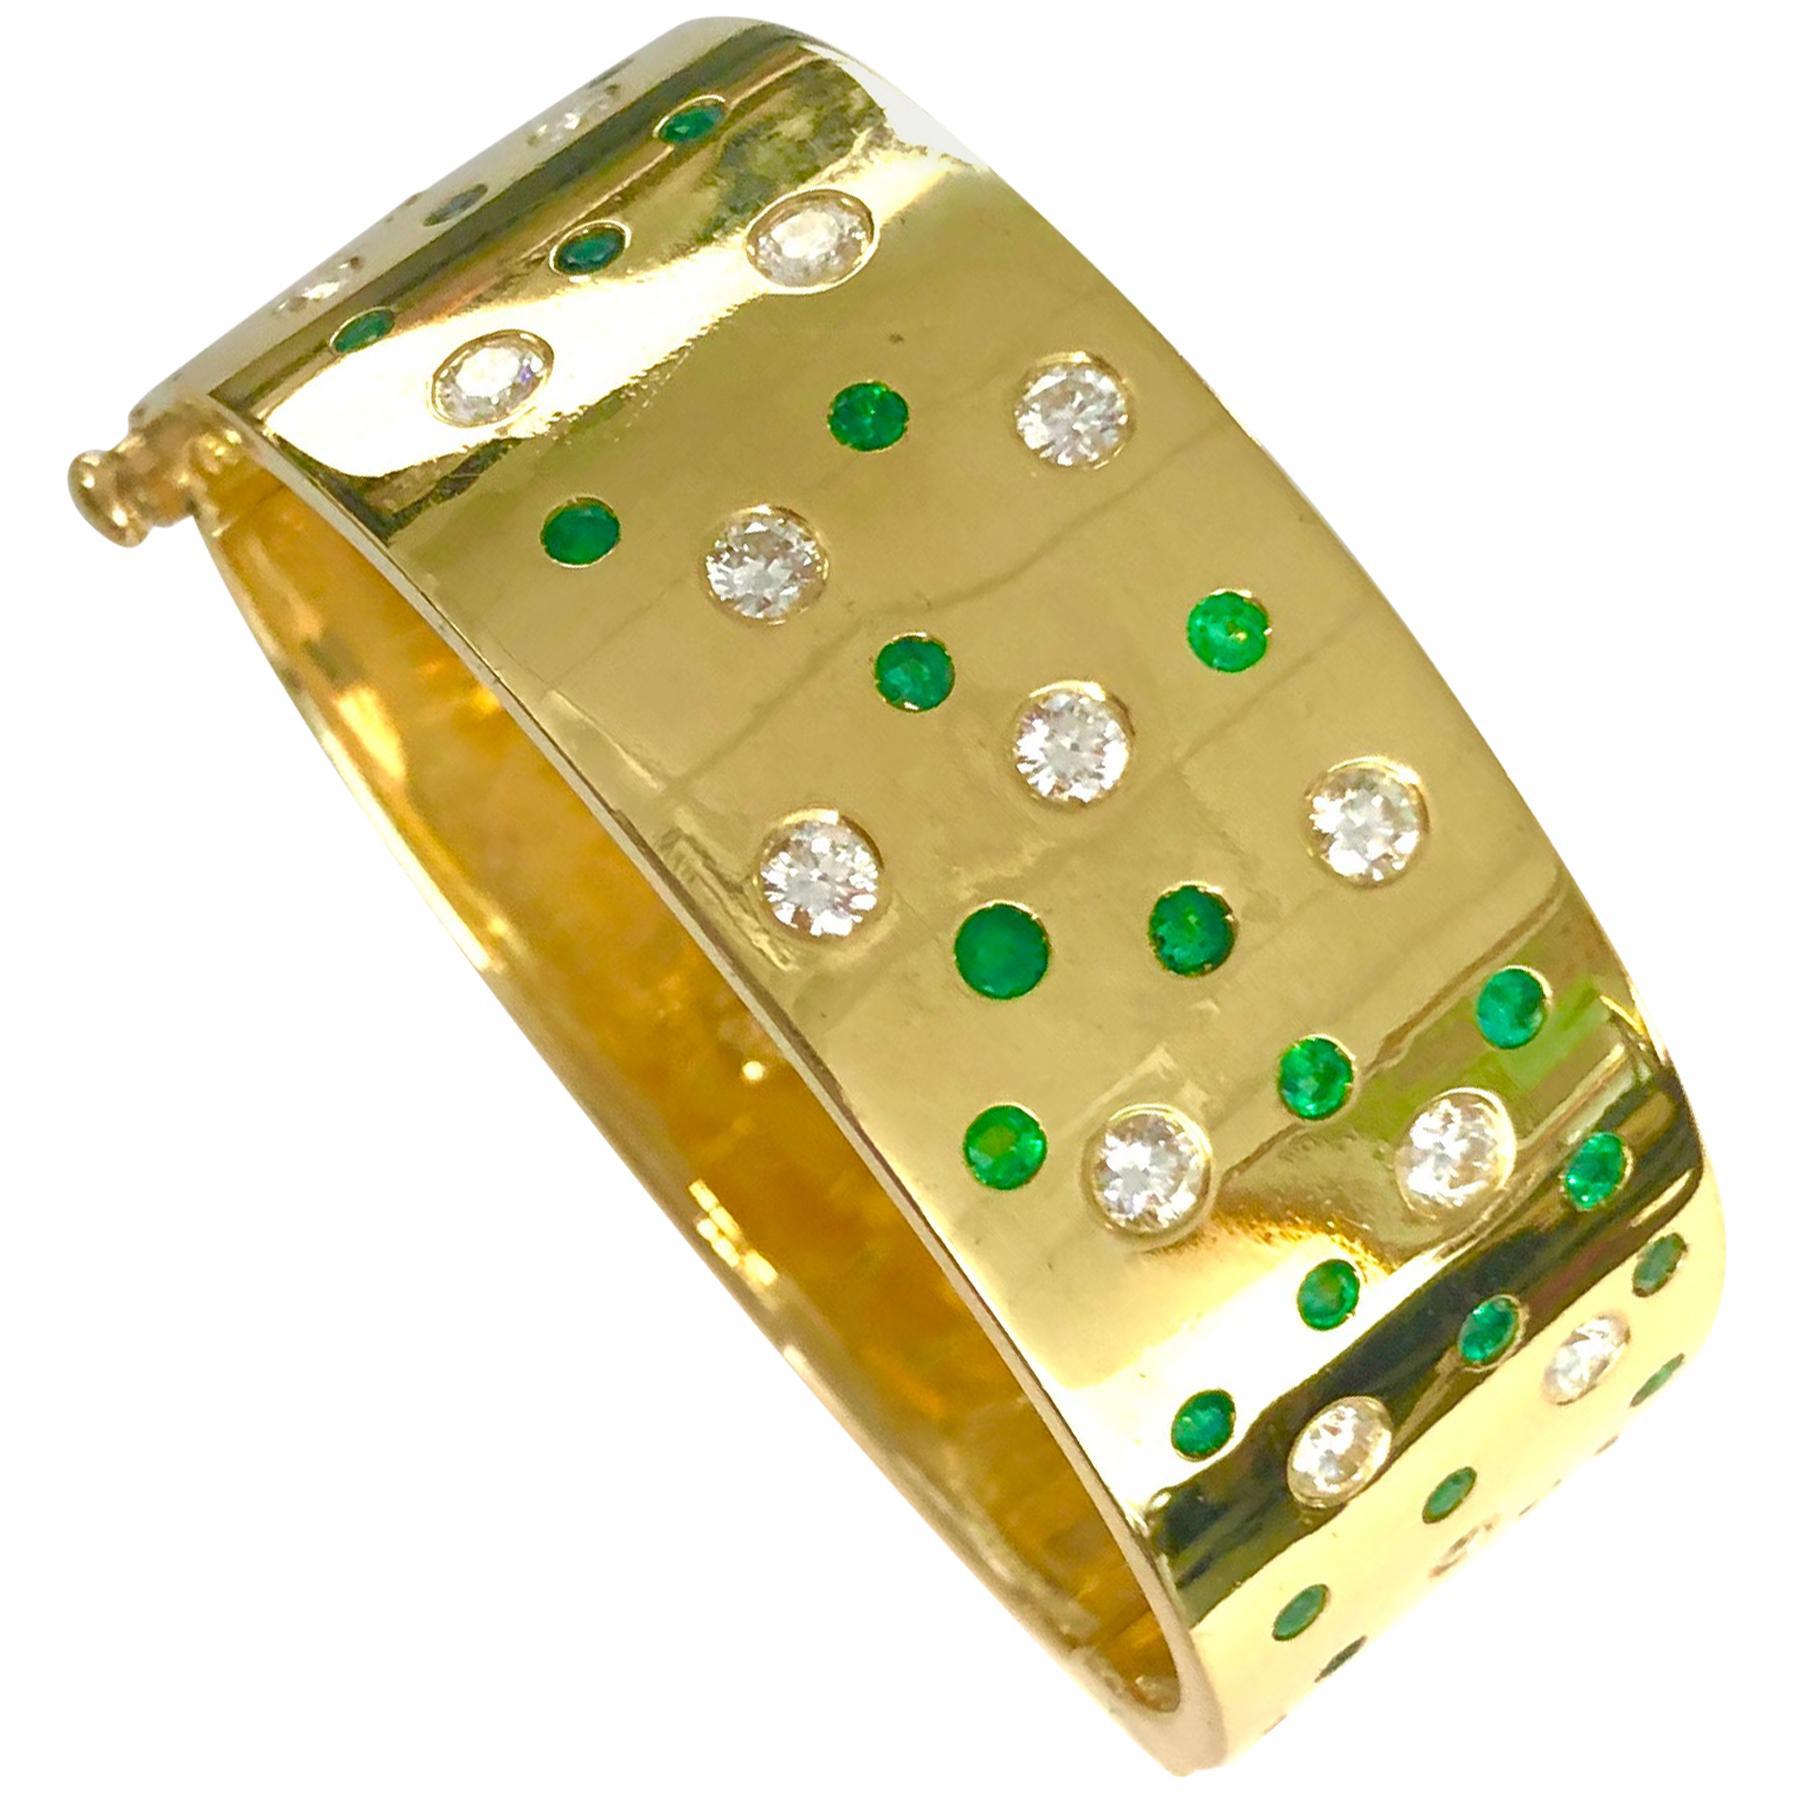 18 Karat Yellow Gold Emerald and Diamond Bangle Bracelet